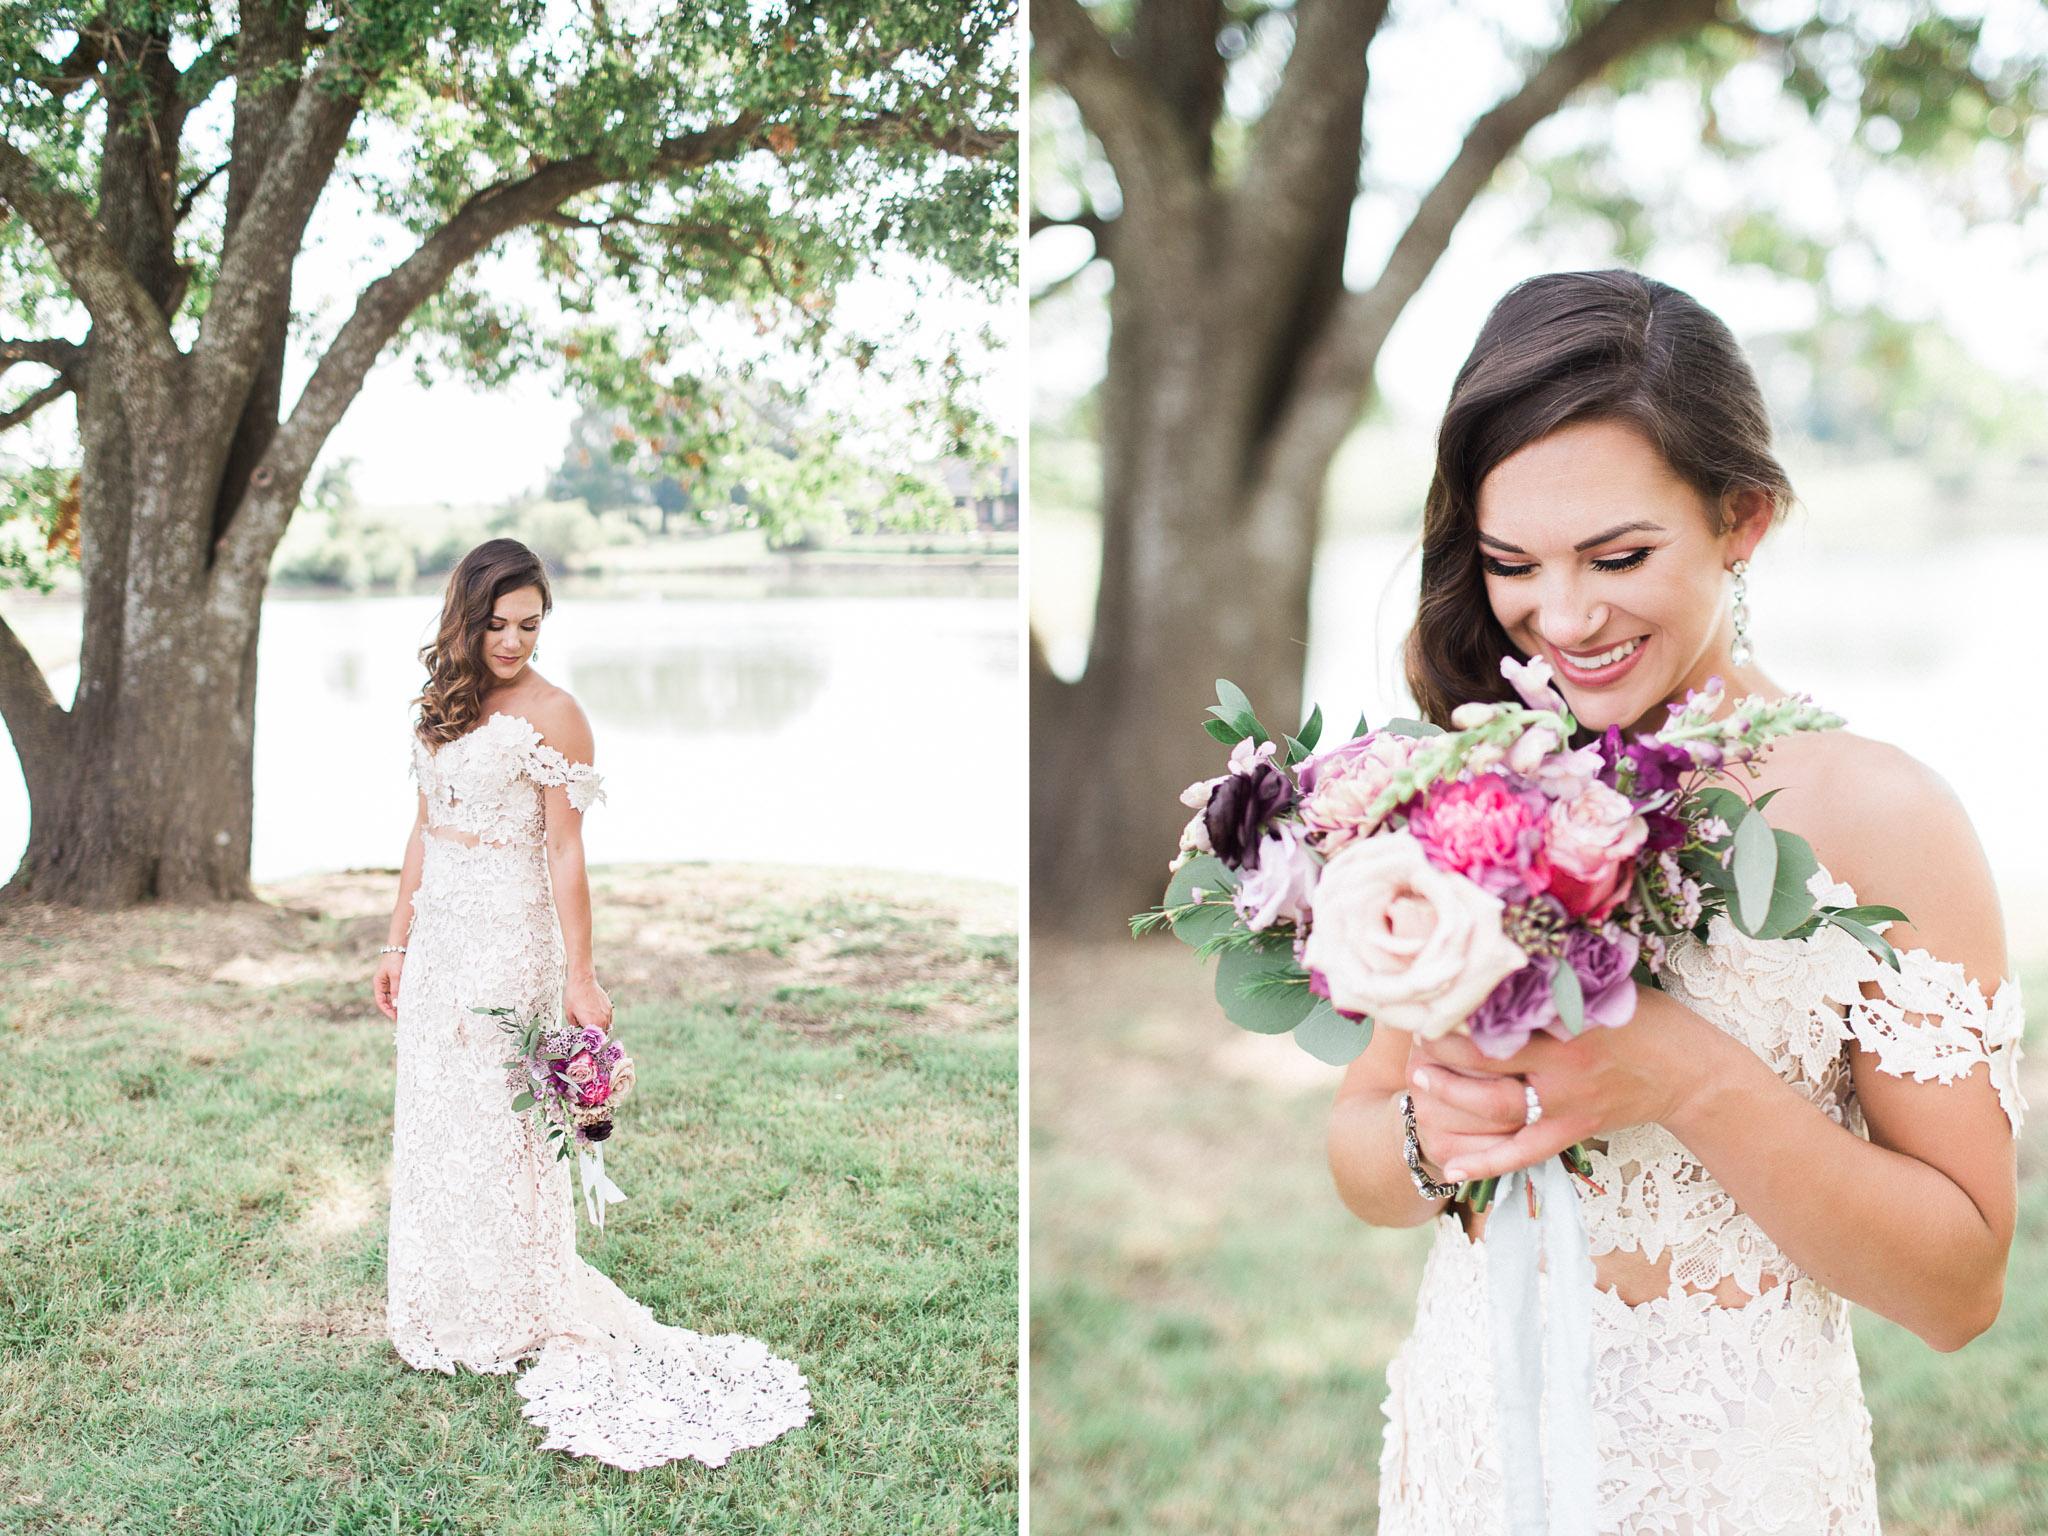 TheBigFakeWedding_DFW_wedding_photographer-105.jpg